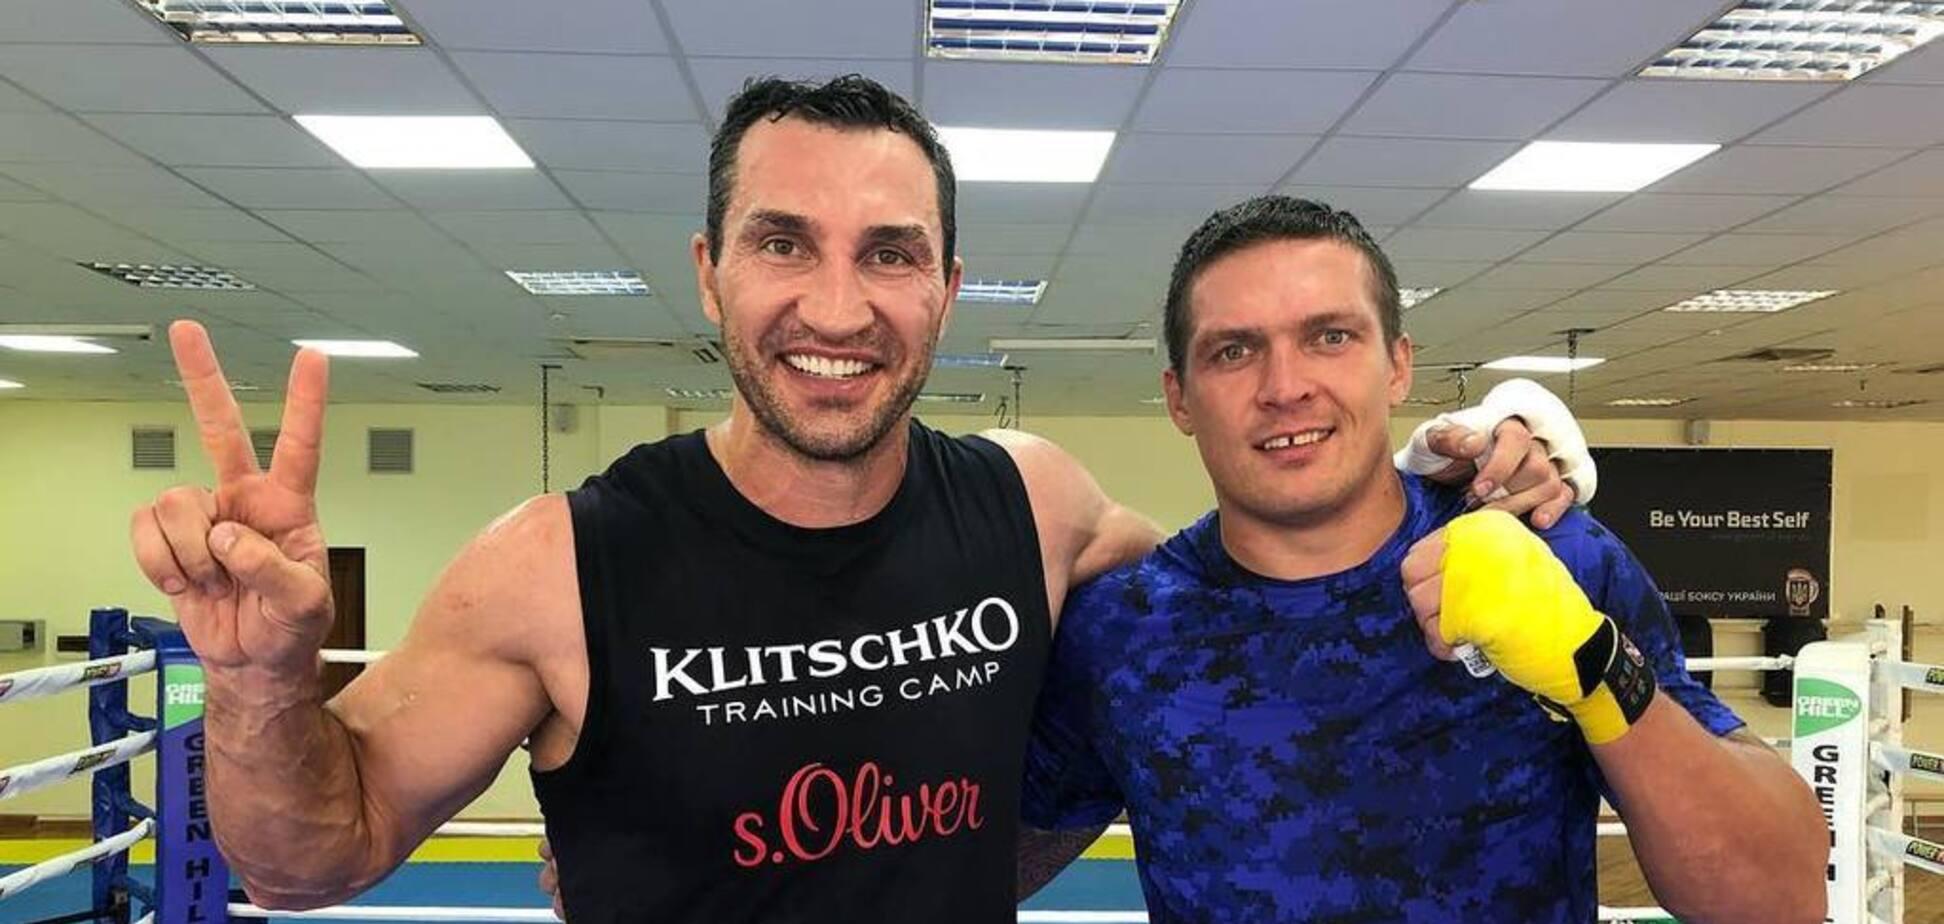 Александр Усик и Владимир Кличко. Источник: instagram.com/usykaa